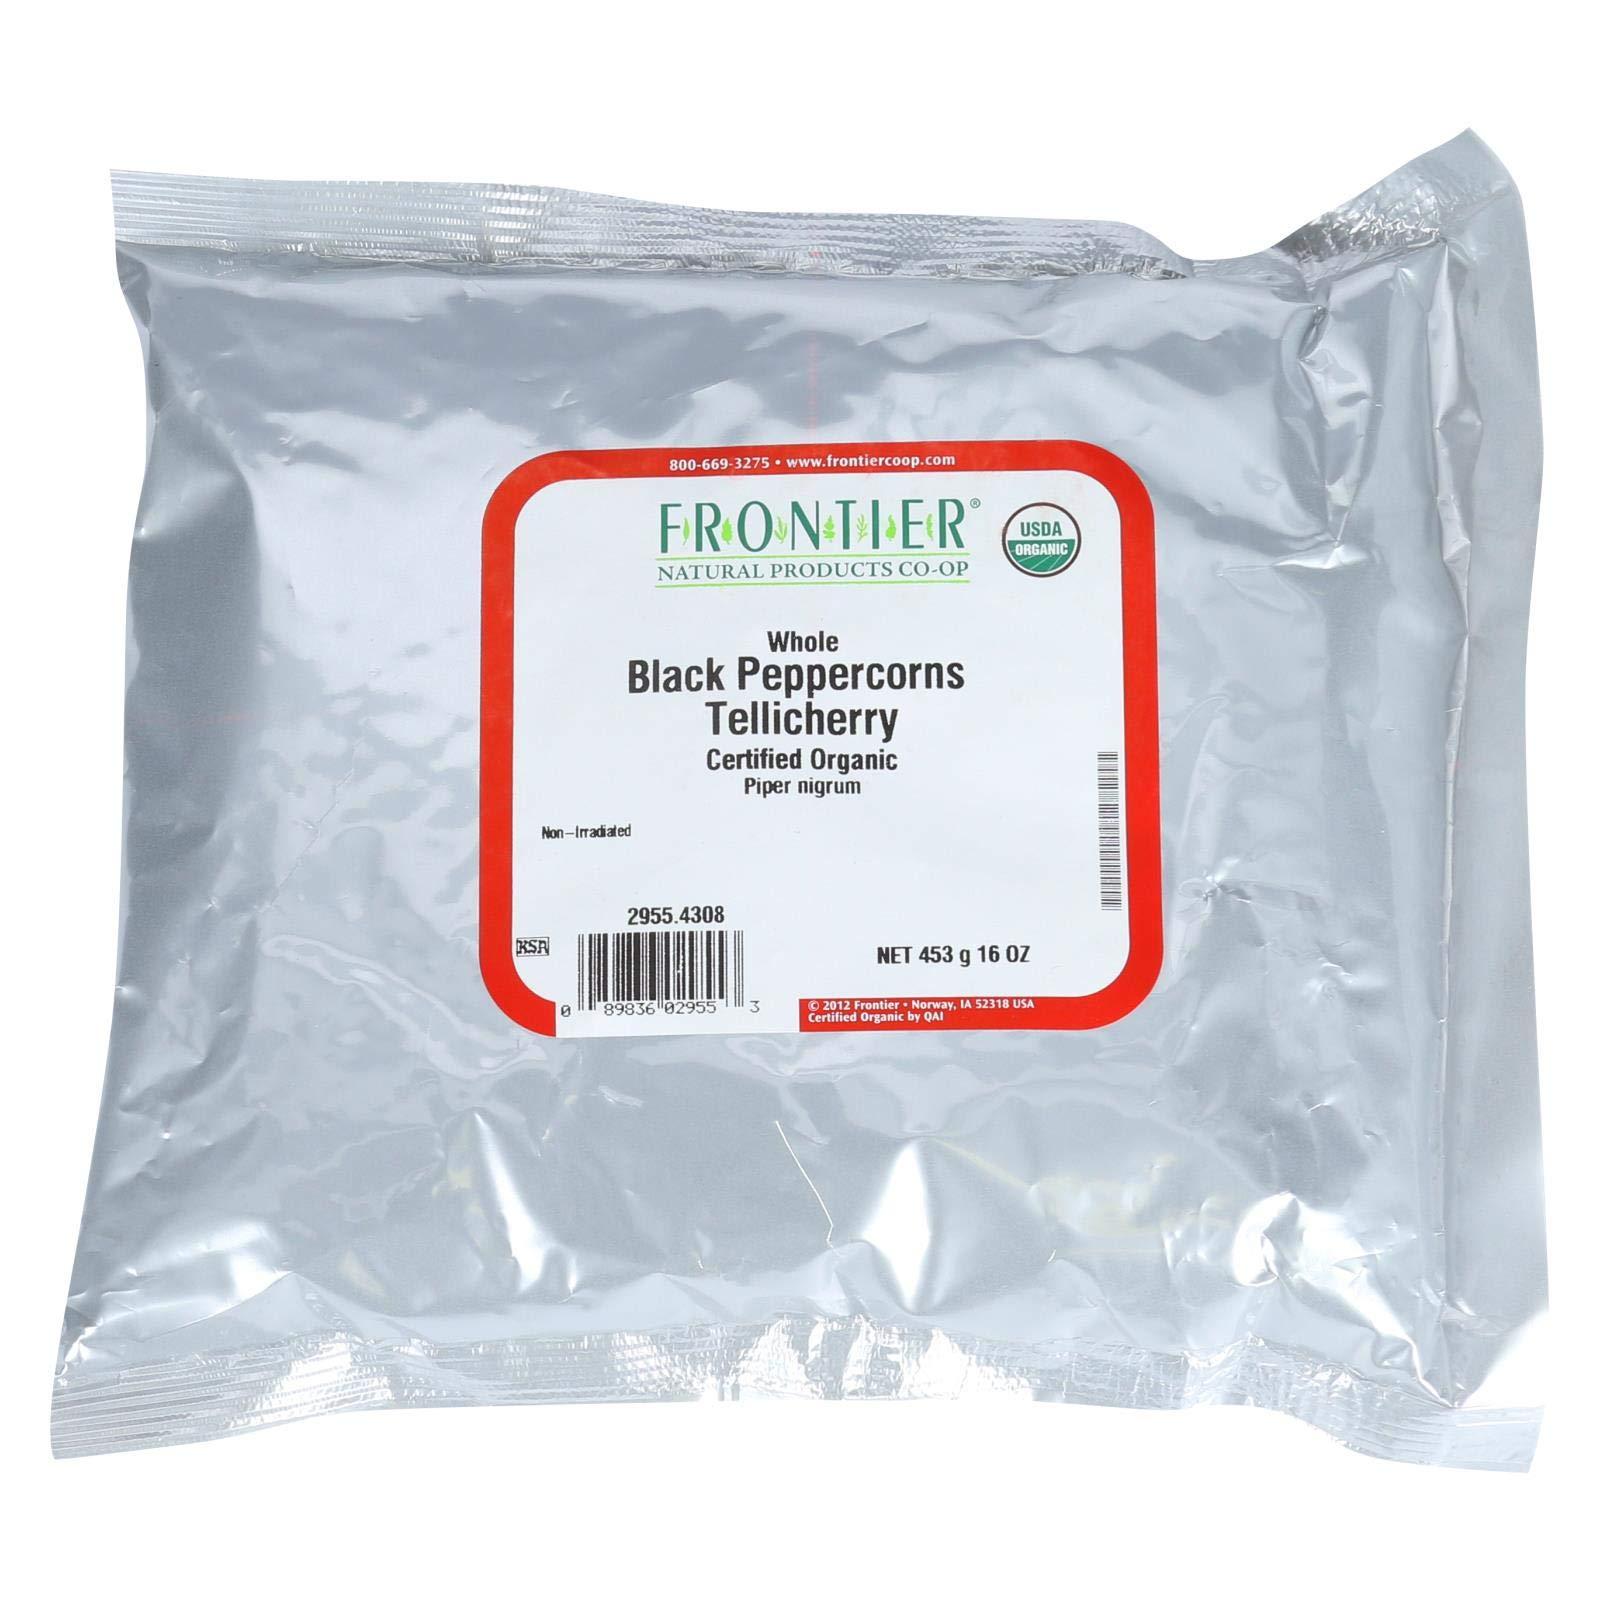 Frontier Herb Bulk Peppercorns Organic Whole Black Tellicherry Grade, 1 Pound